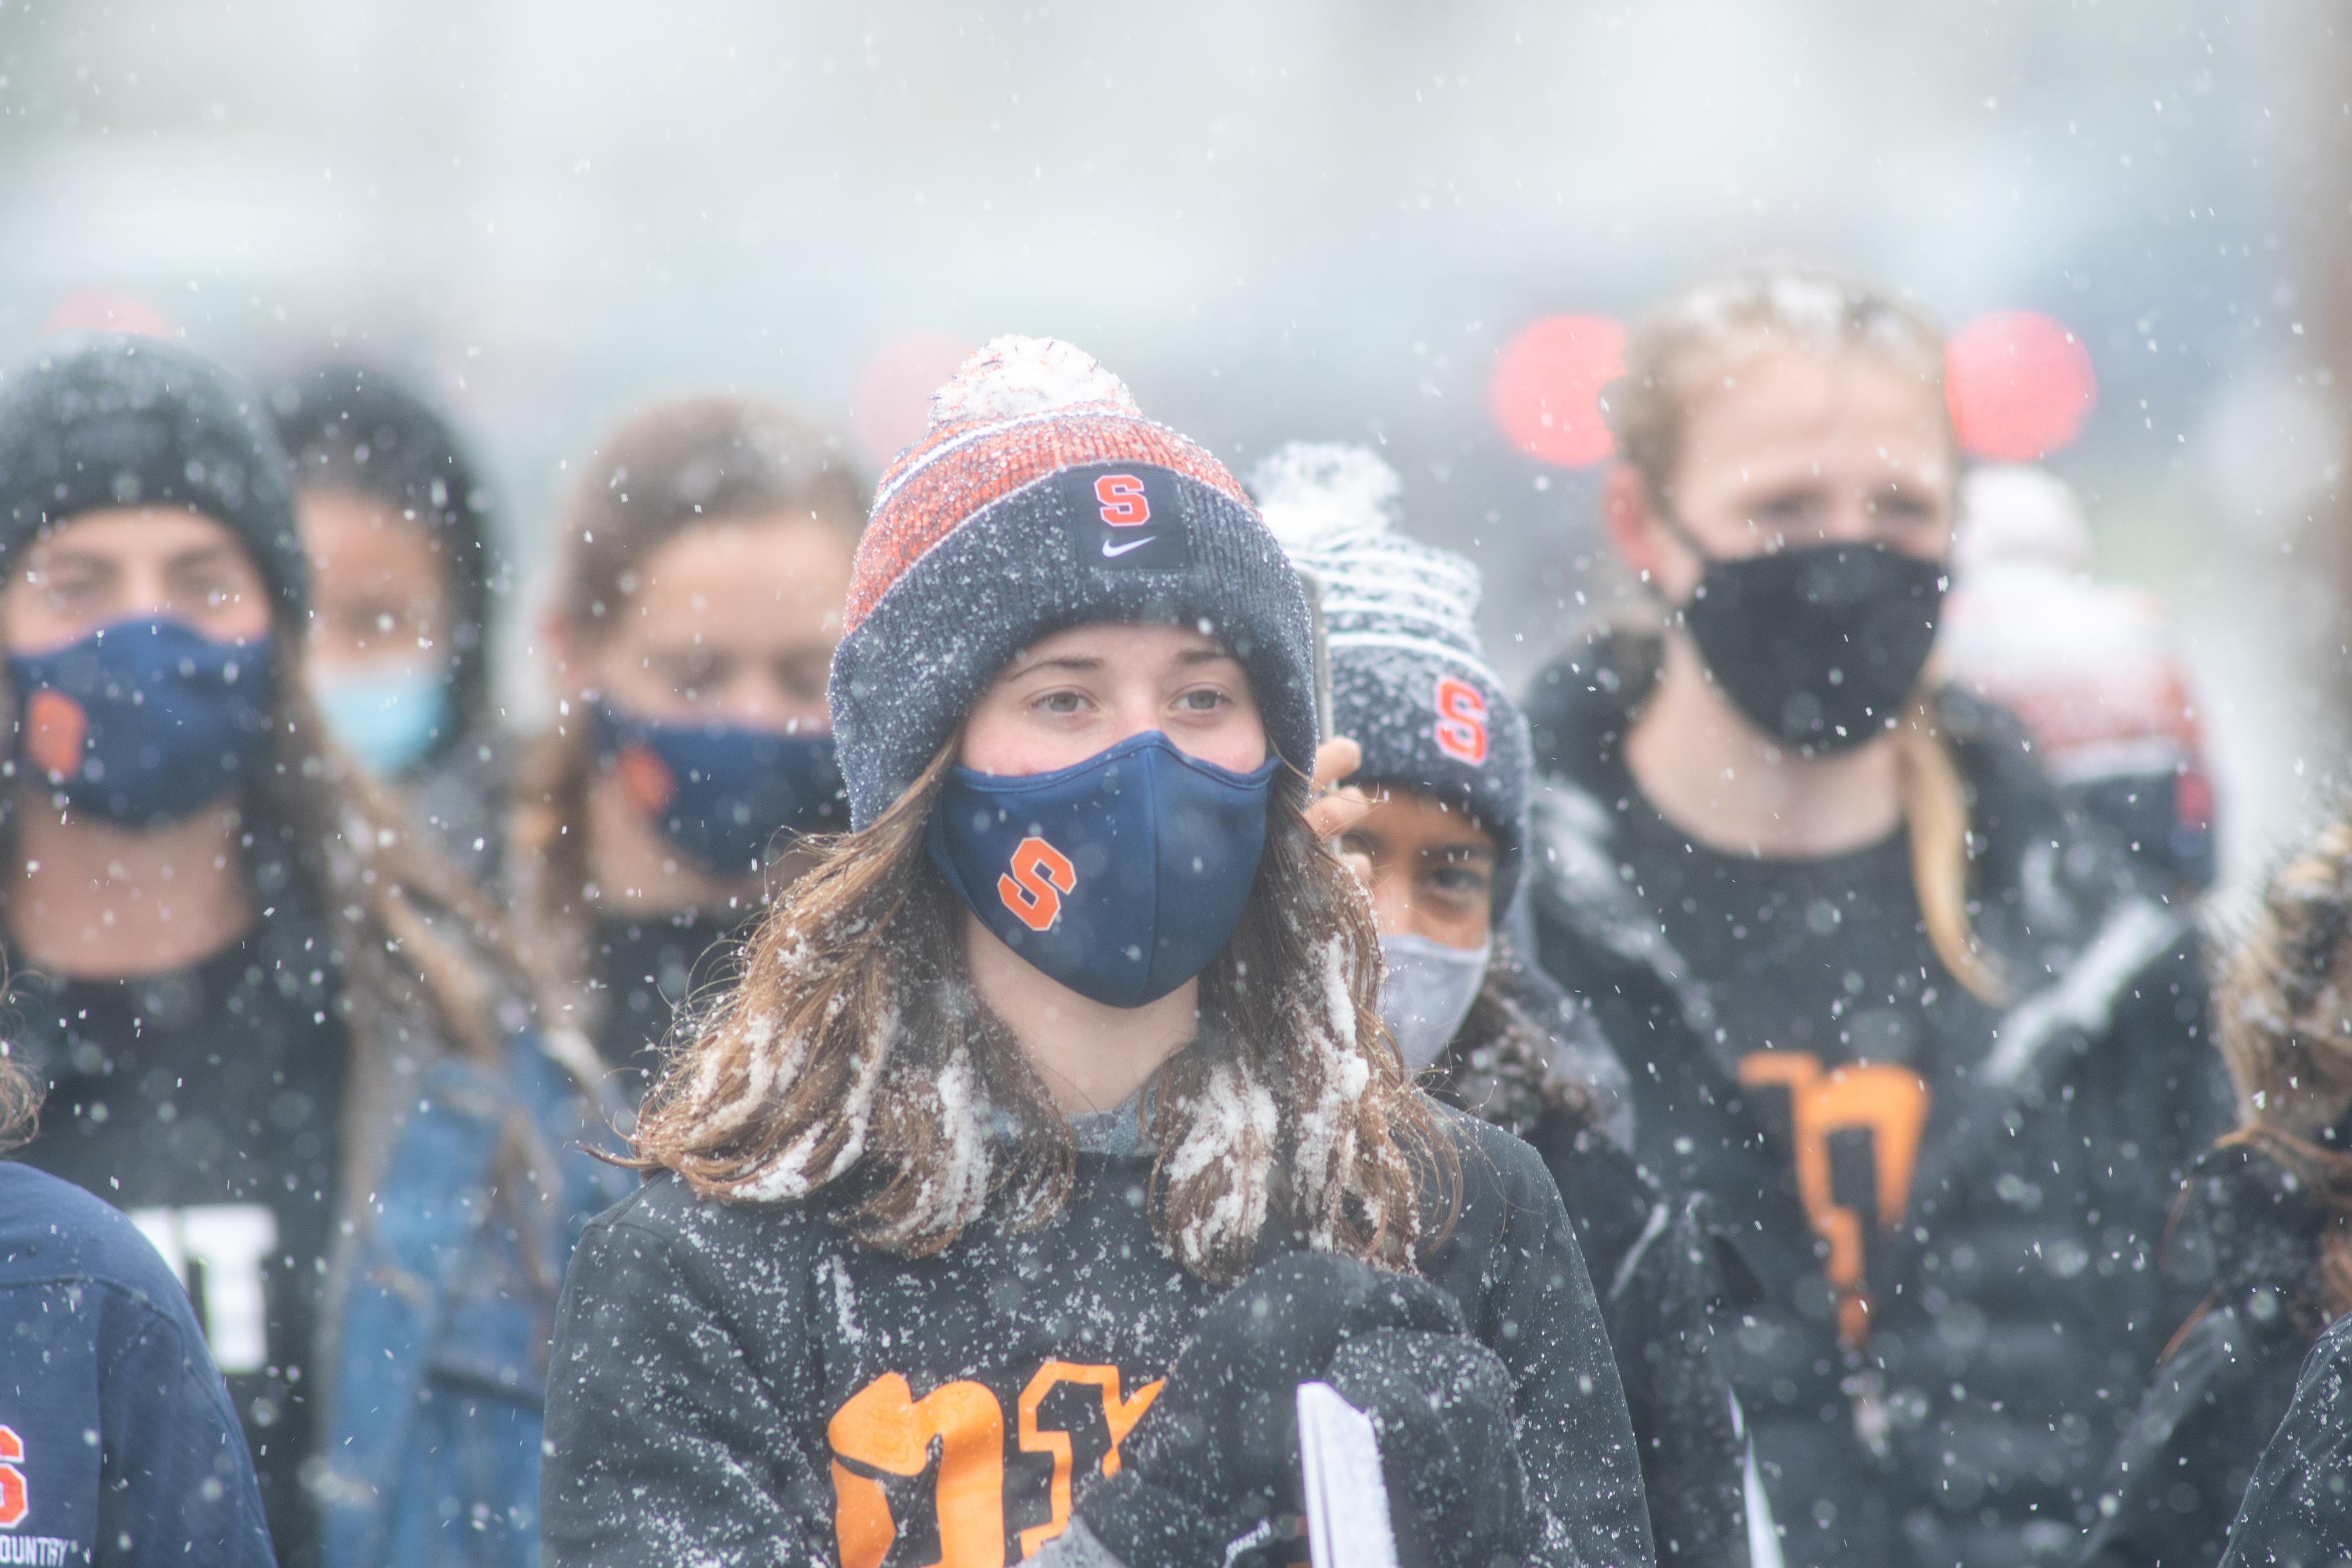 Syracuse Black Athlete Lives Matter March